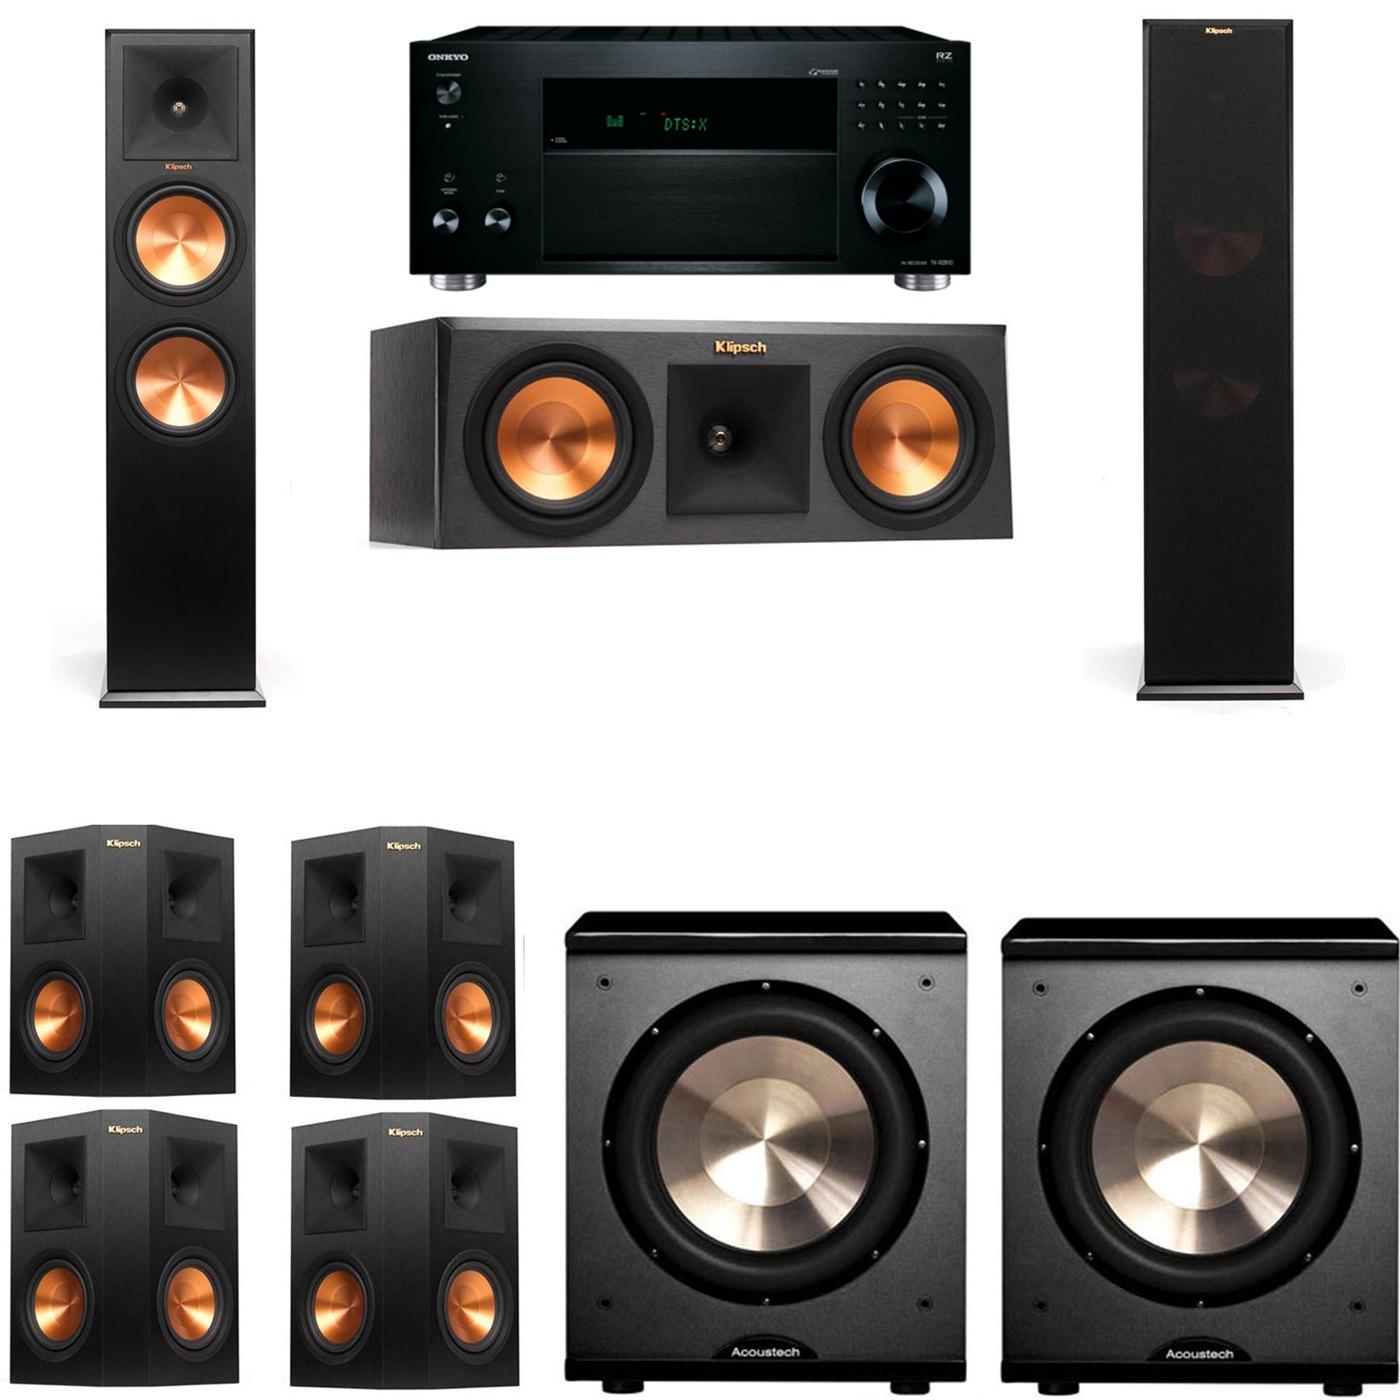 Klipsch RP-280F Tower Speakers-RP-250C-PL-200-7.2-Onkyo TX-RZ810